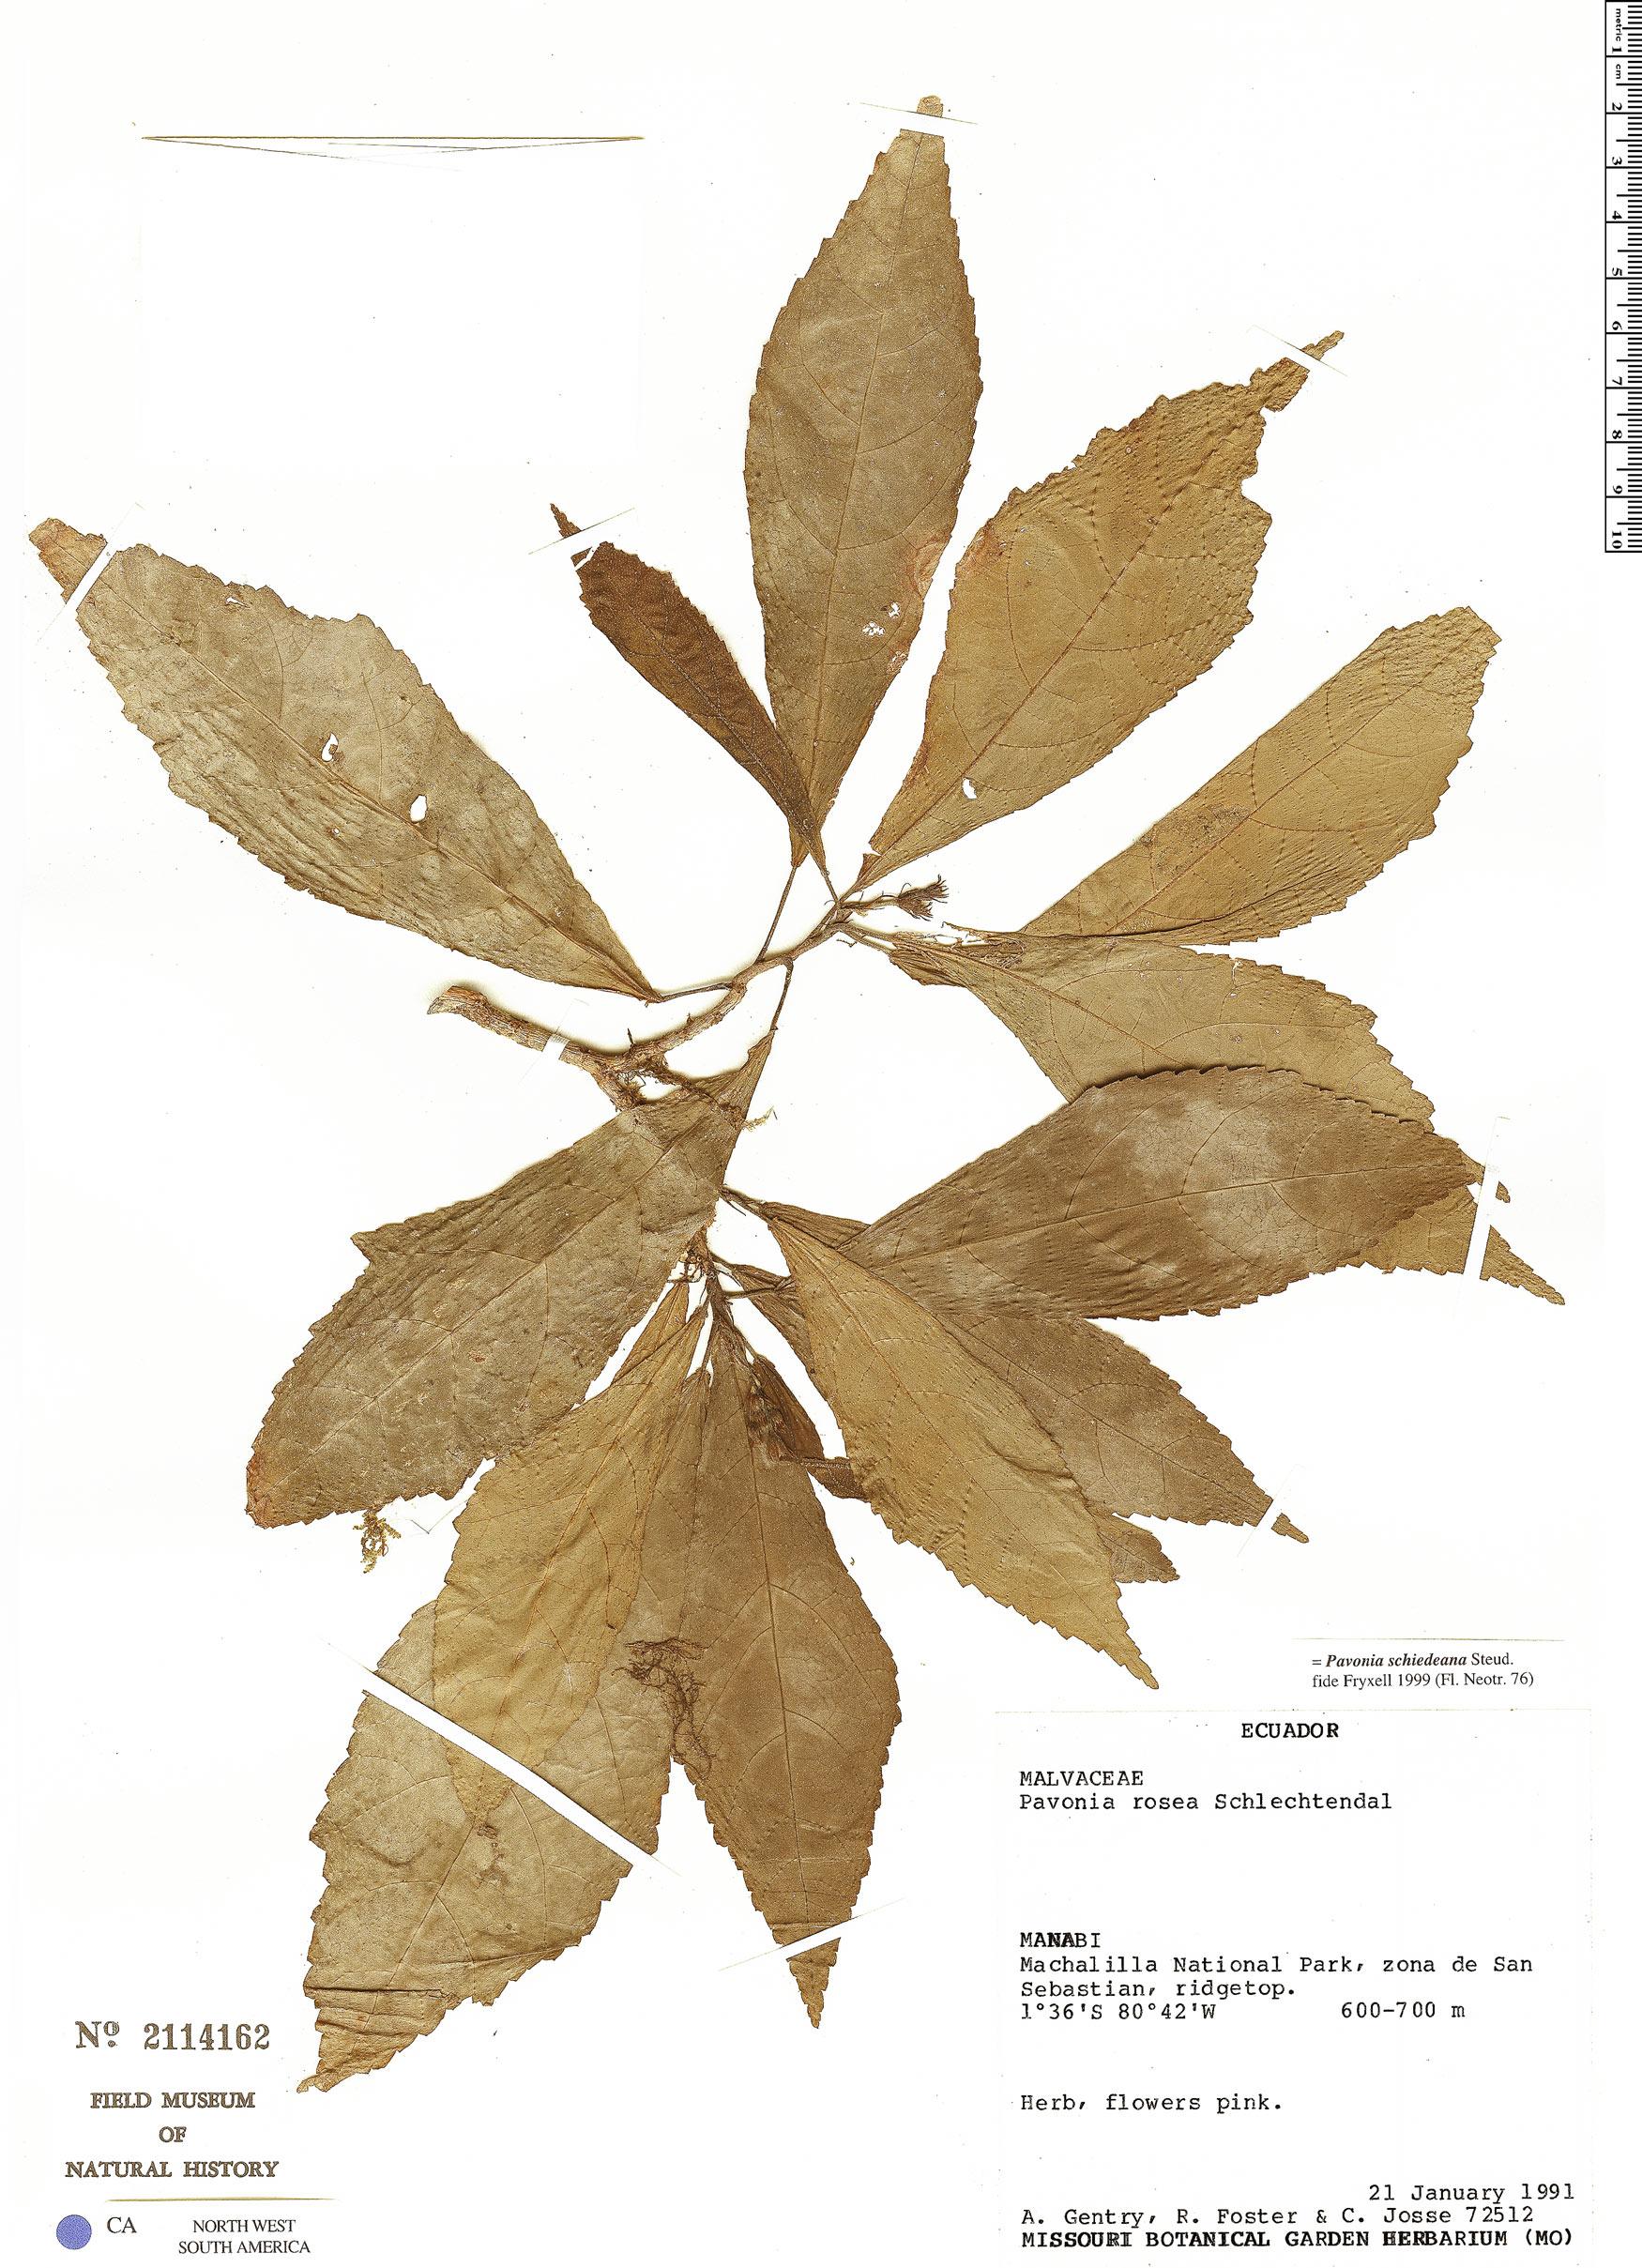 Specimen: Pavonia schiedeana